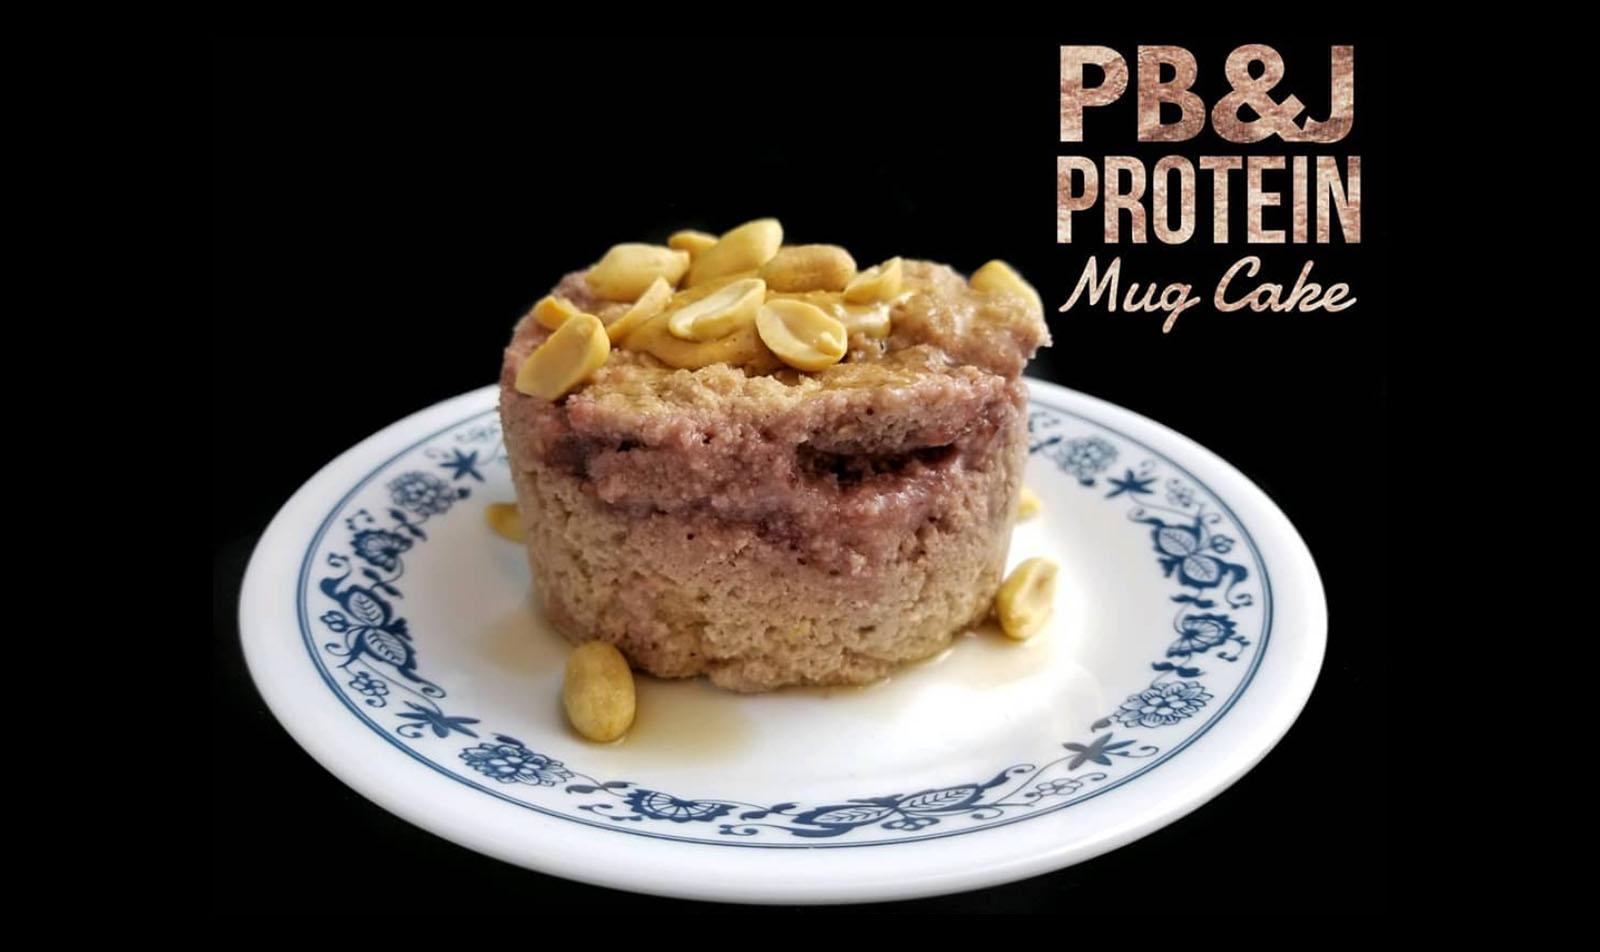 Protein mug cake